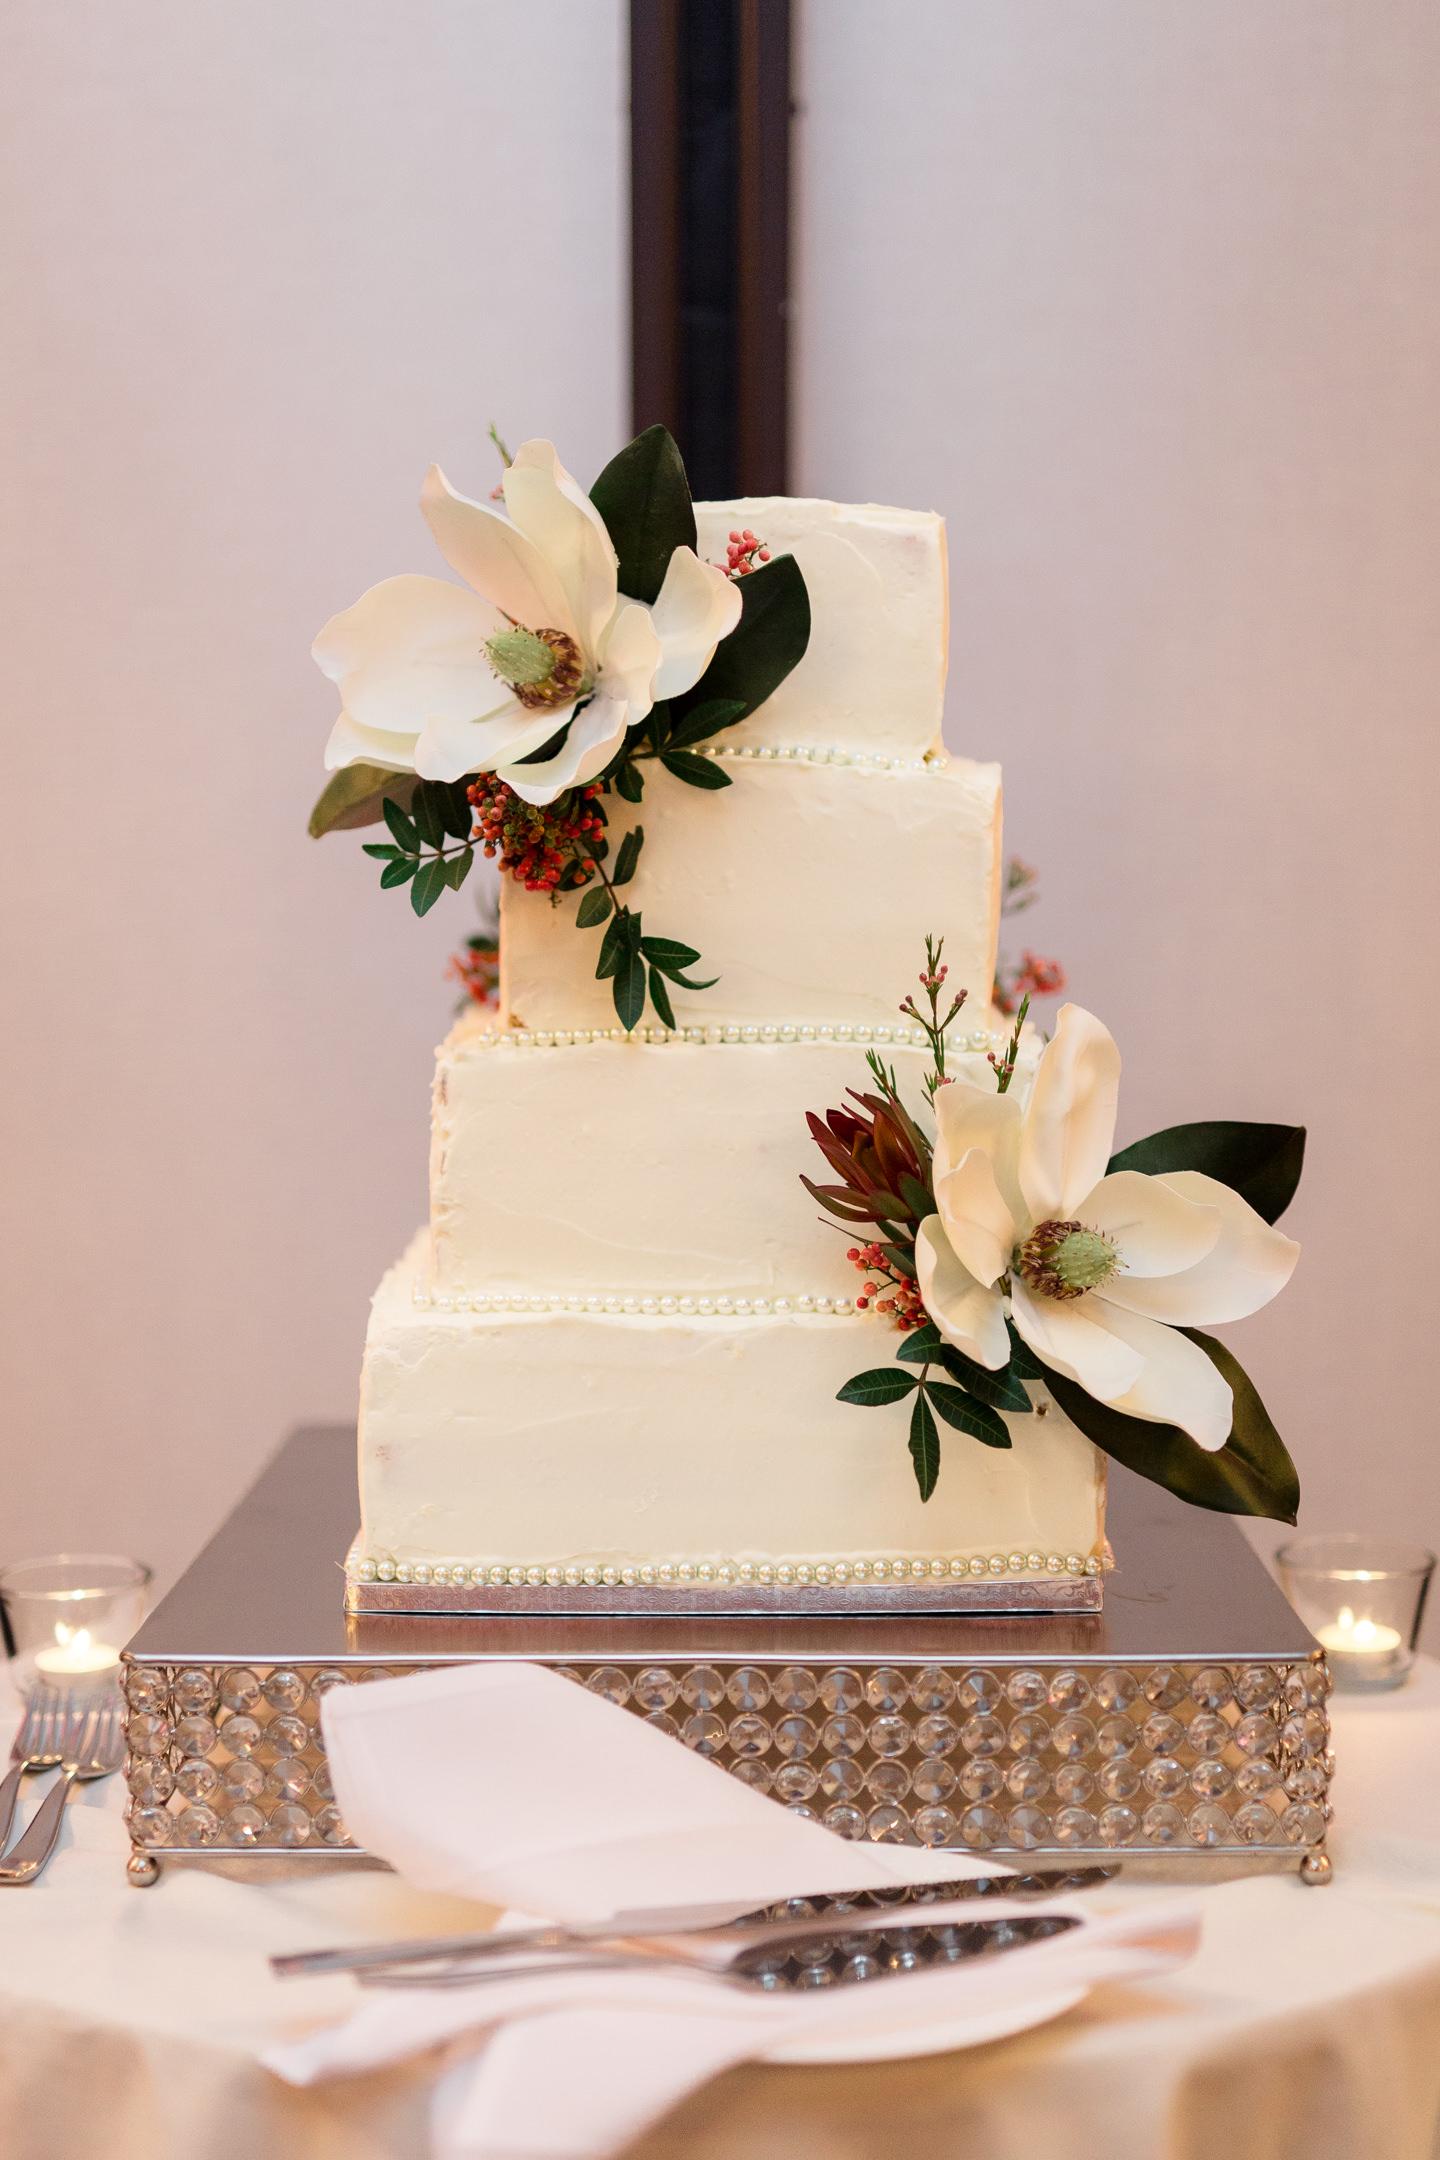 Documentary-Wedding-Photography-Andrew-Tat-Maria & AJ-29.jpg